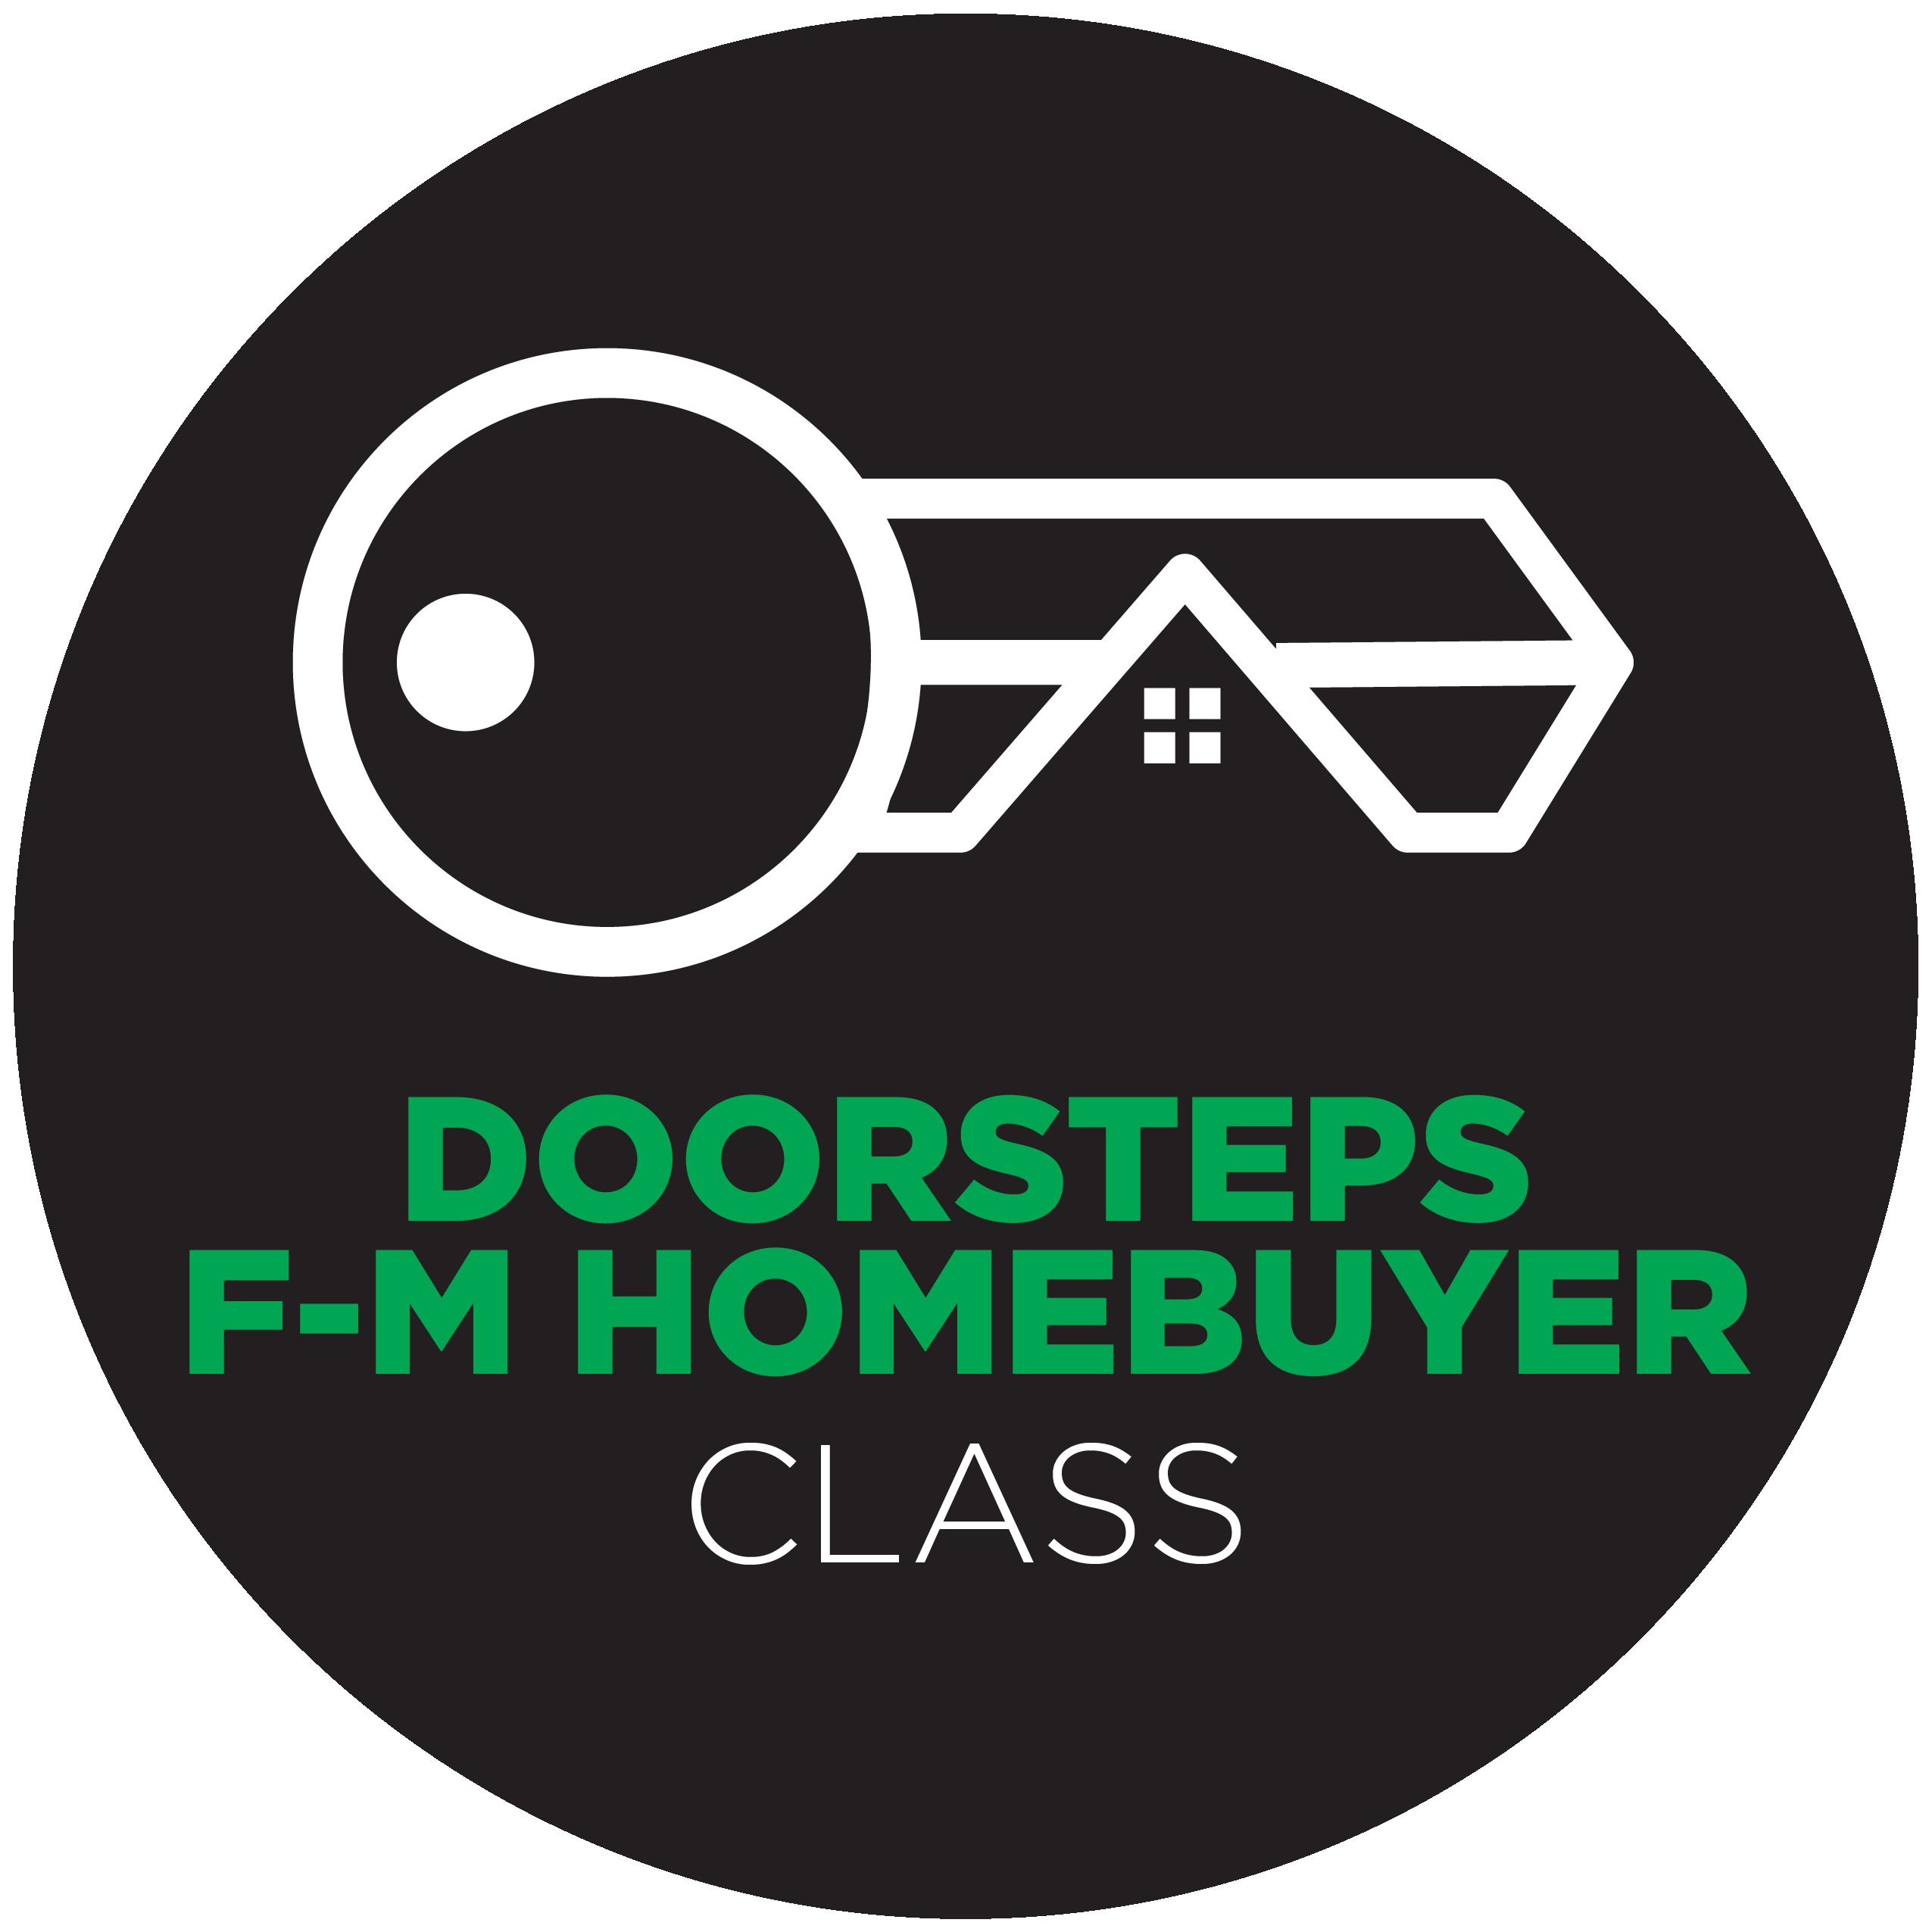 F-M Homebuyer Class